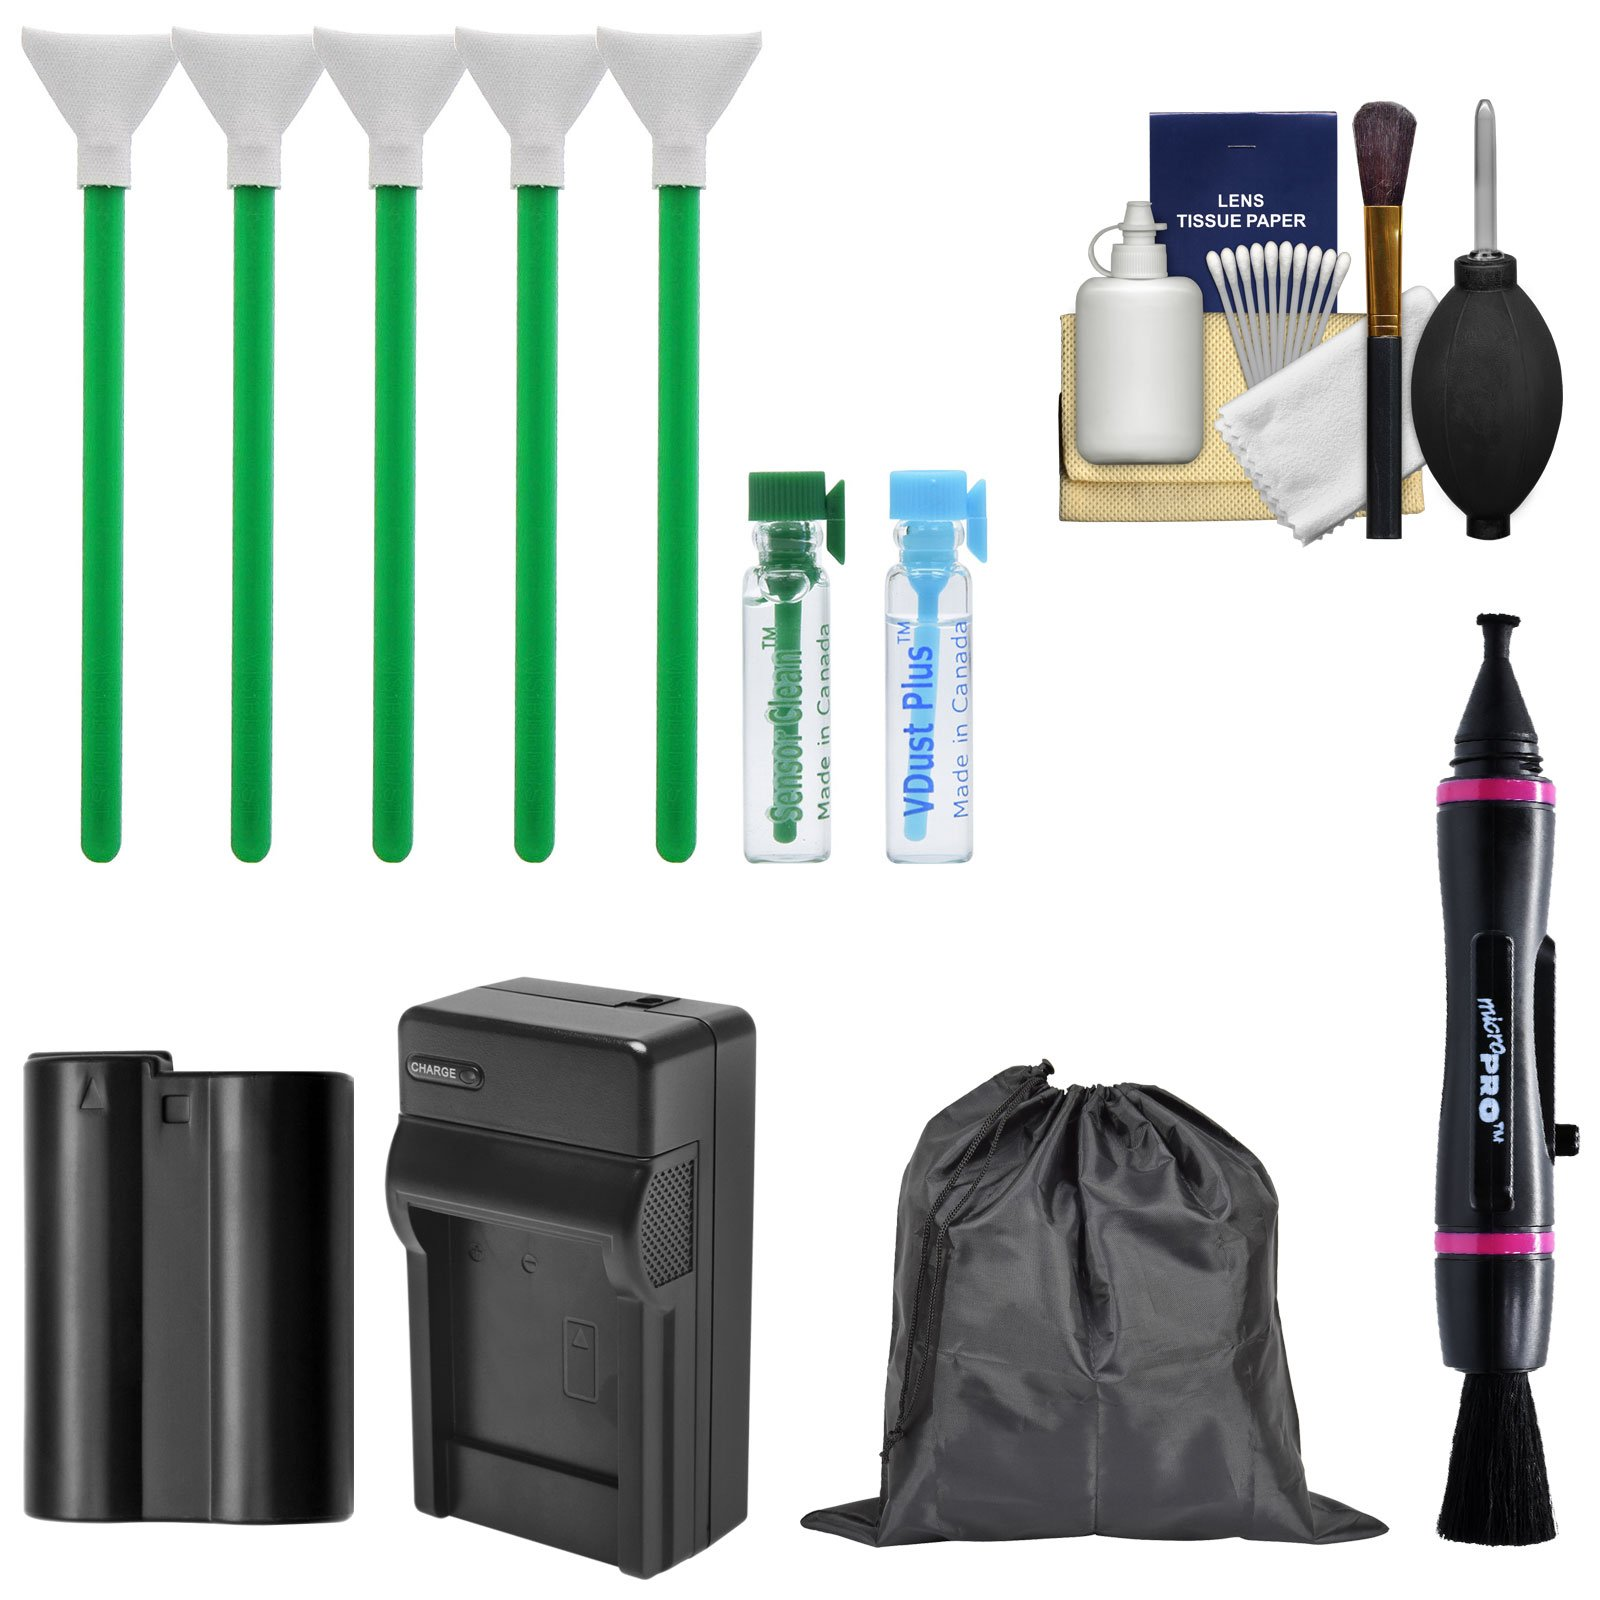 Essential Bundle Sensor Cleaning Kit with EN-EL15 Battery & Charger Bundle for Nikon D610, D750, D800, D810, D850 DSLR Cameras